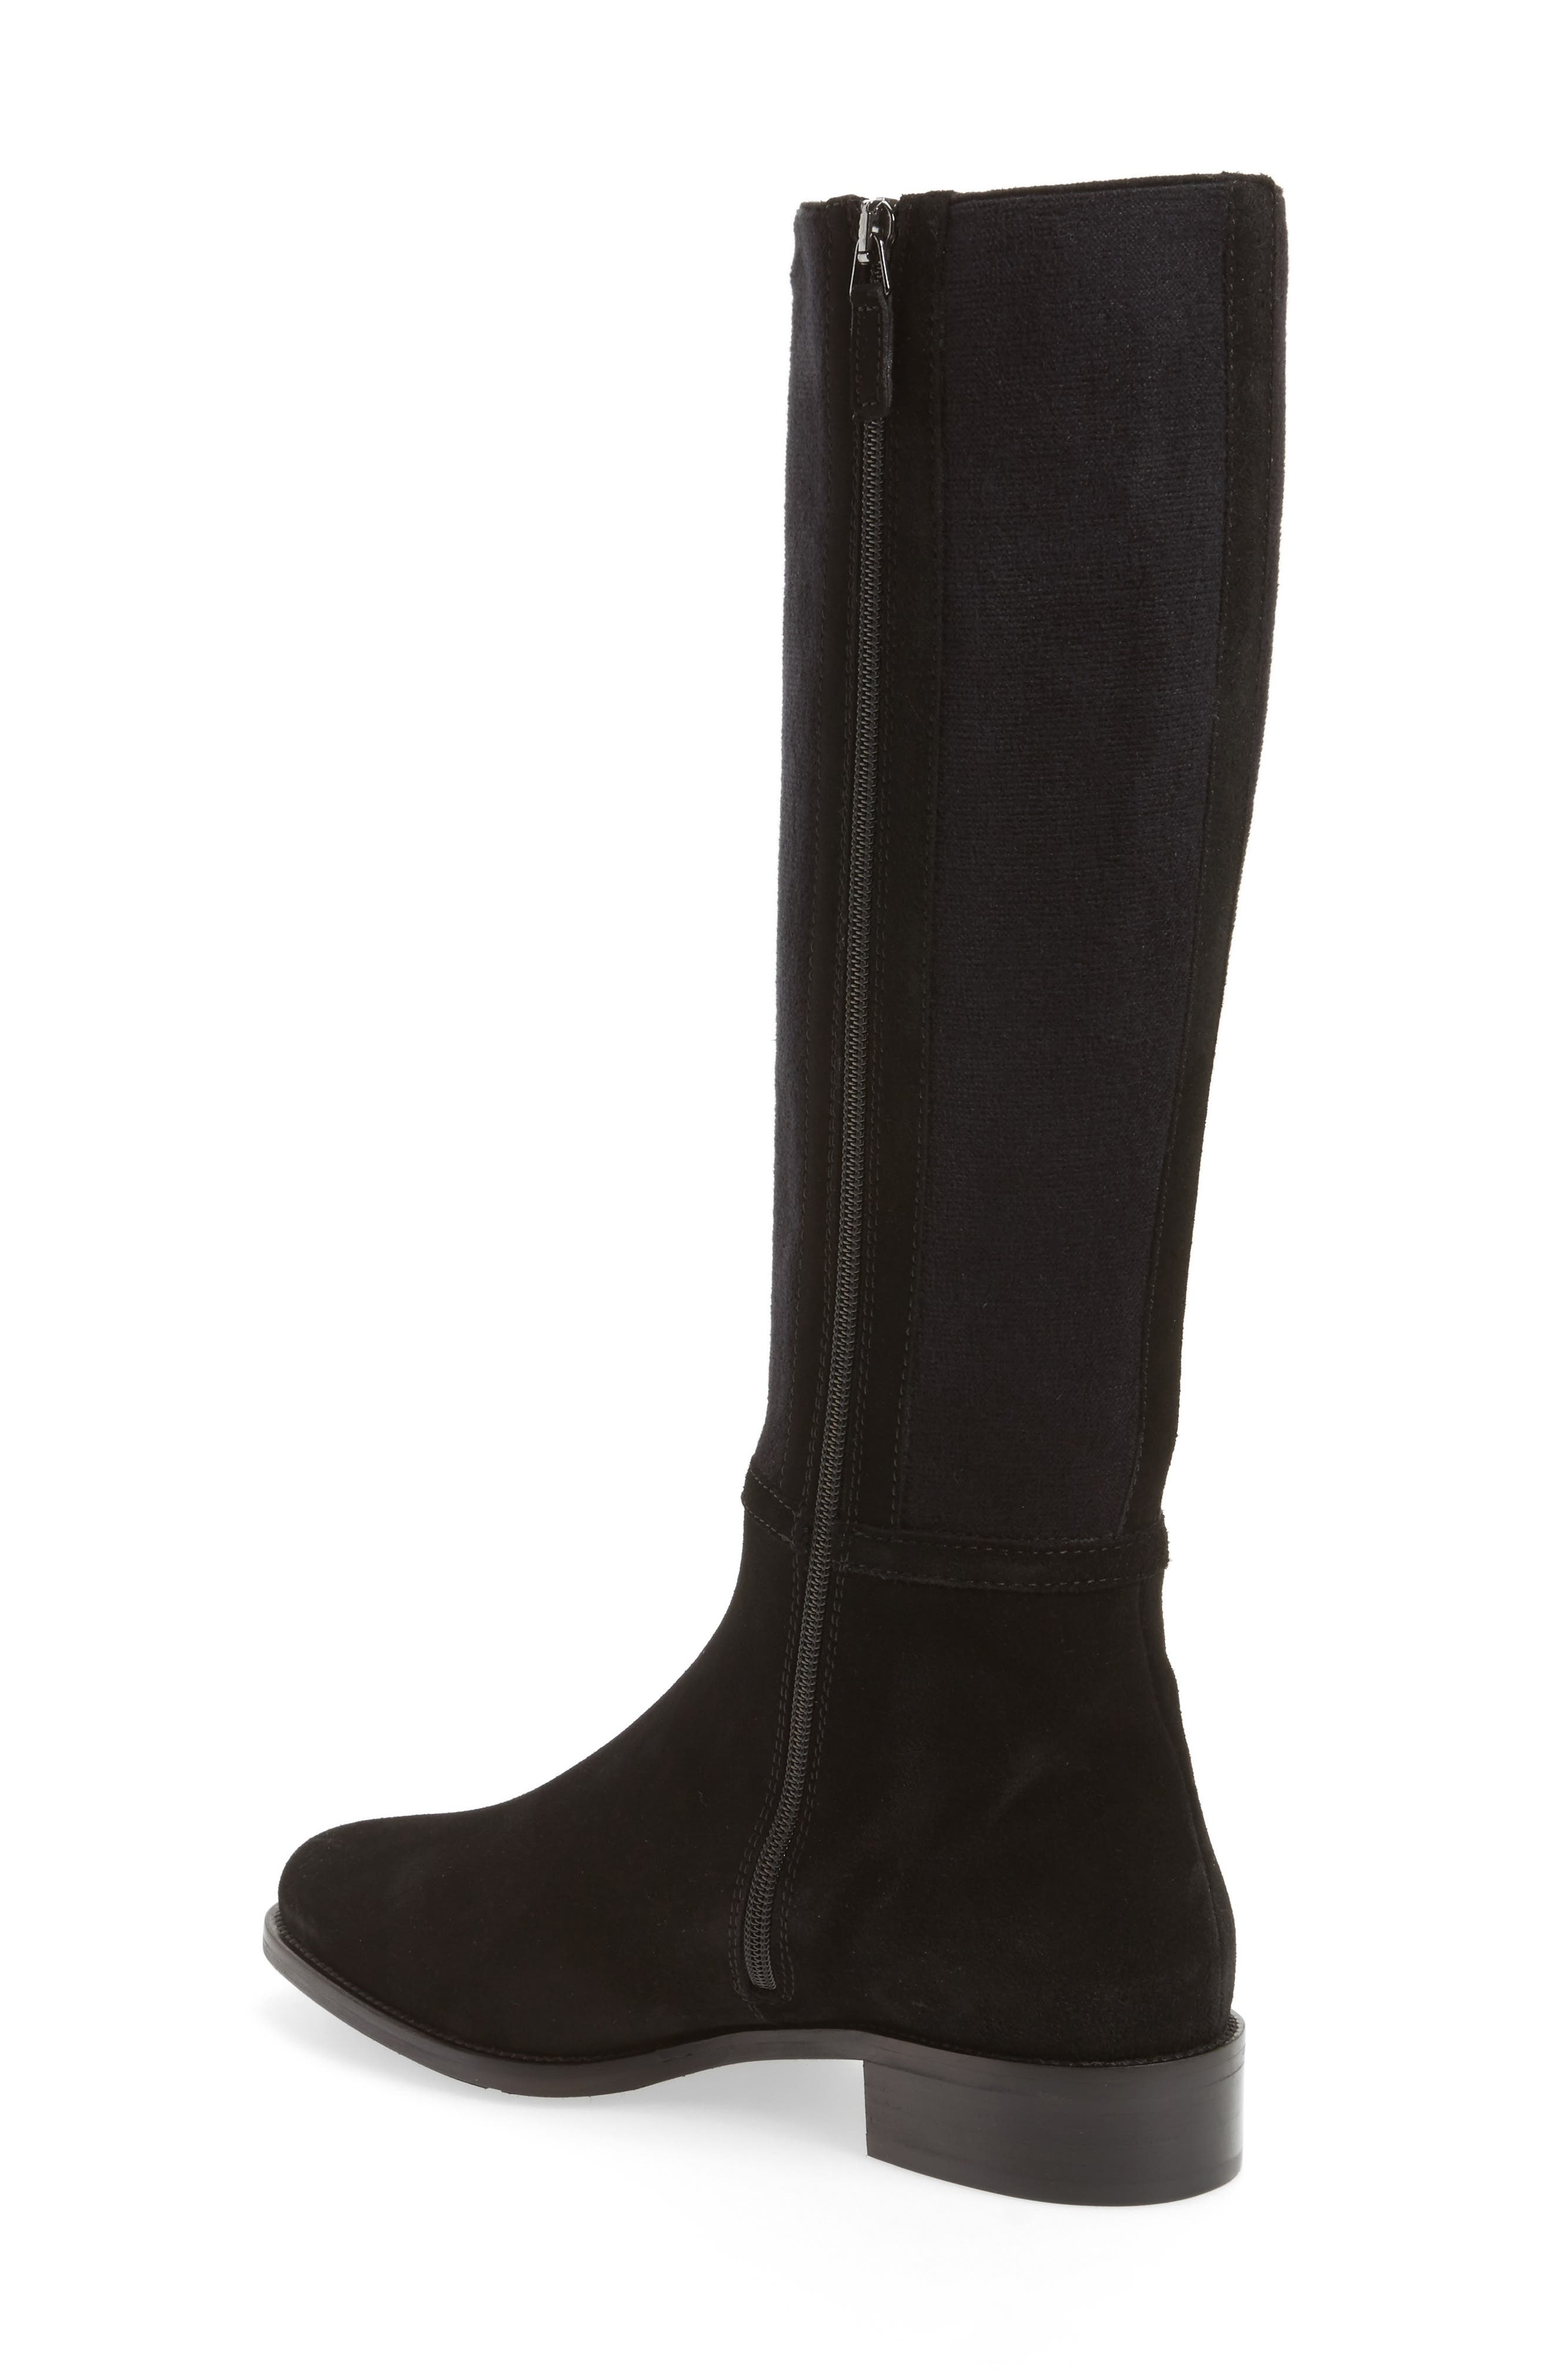 Alternate Image 2  - Aquatalia Nicolette Knee High Weatherproof Boot (Women)